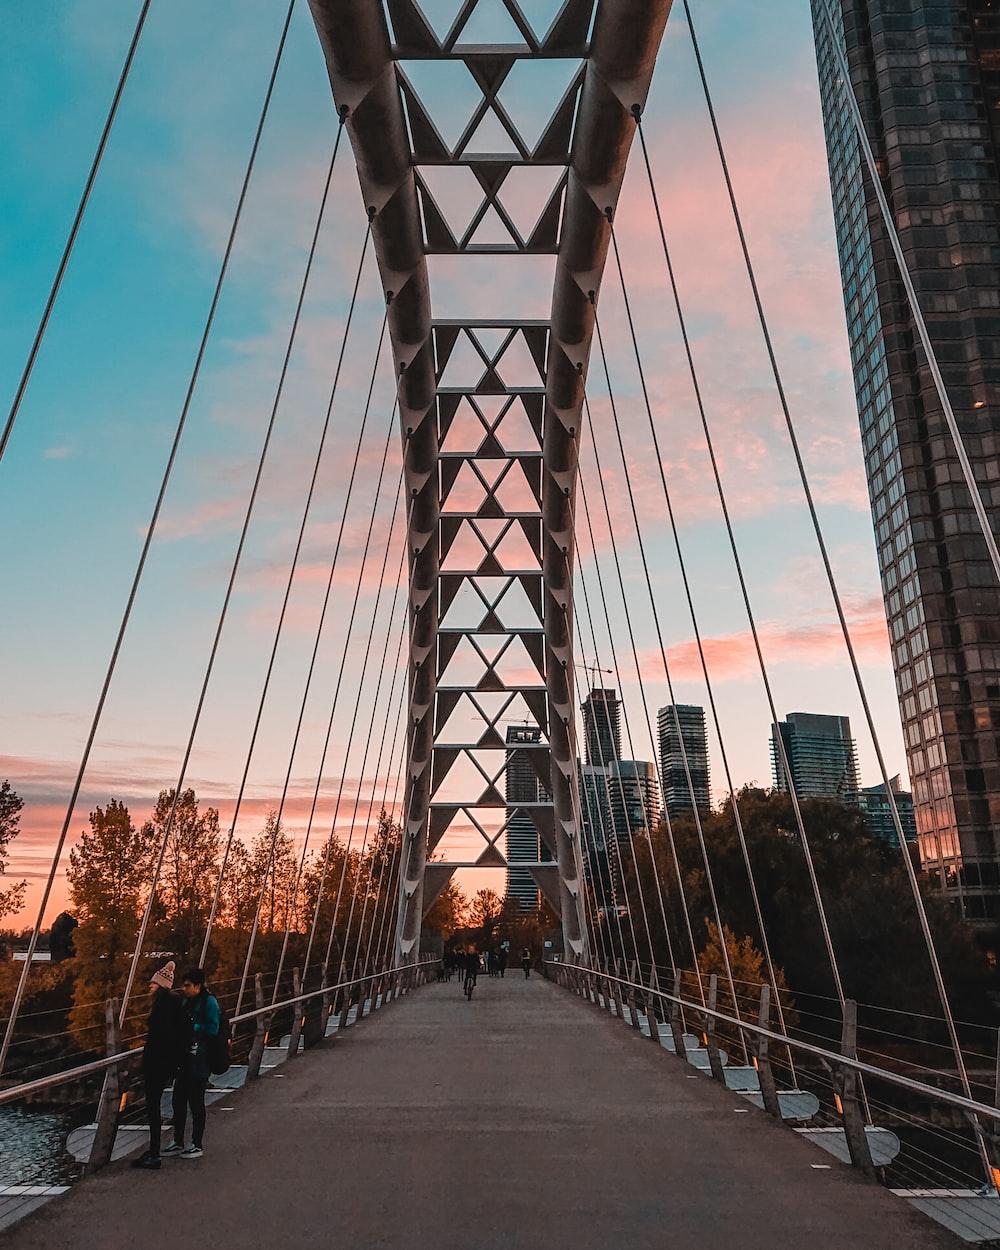 gray concrete bridge at daytime